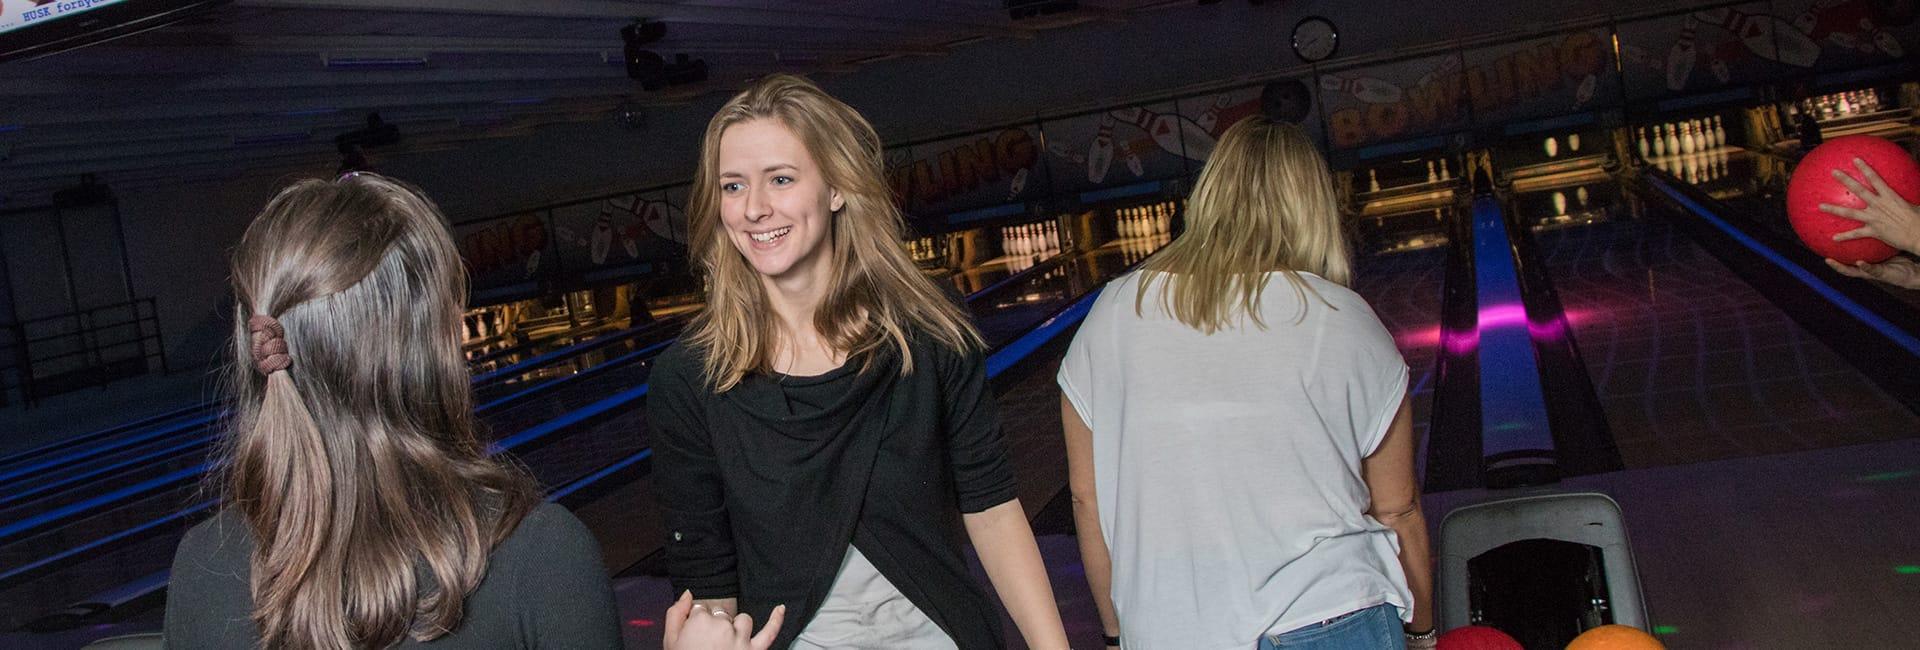 Bowling Odense